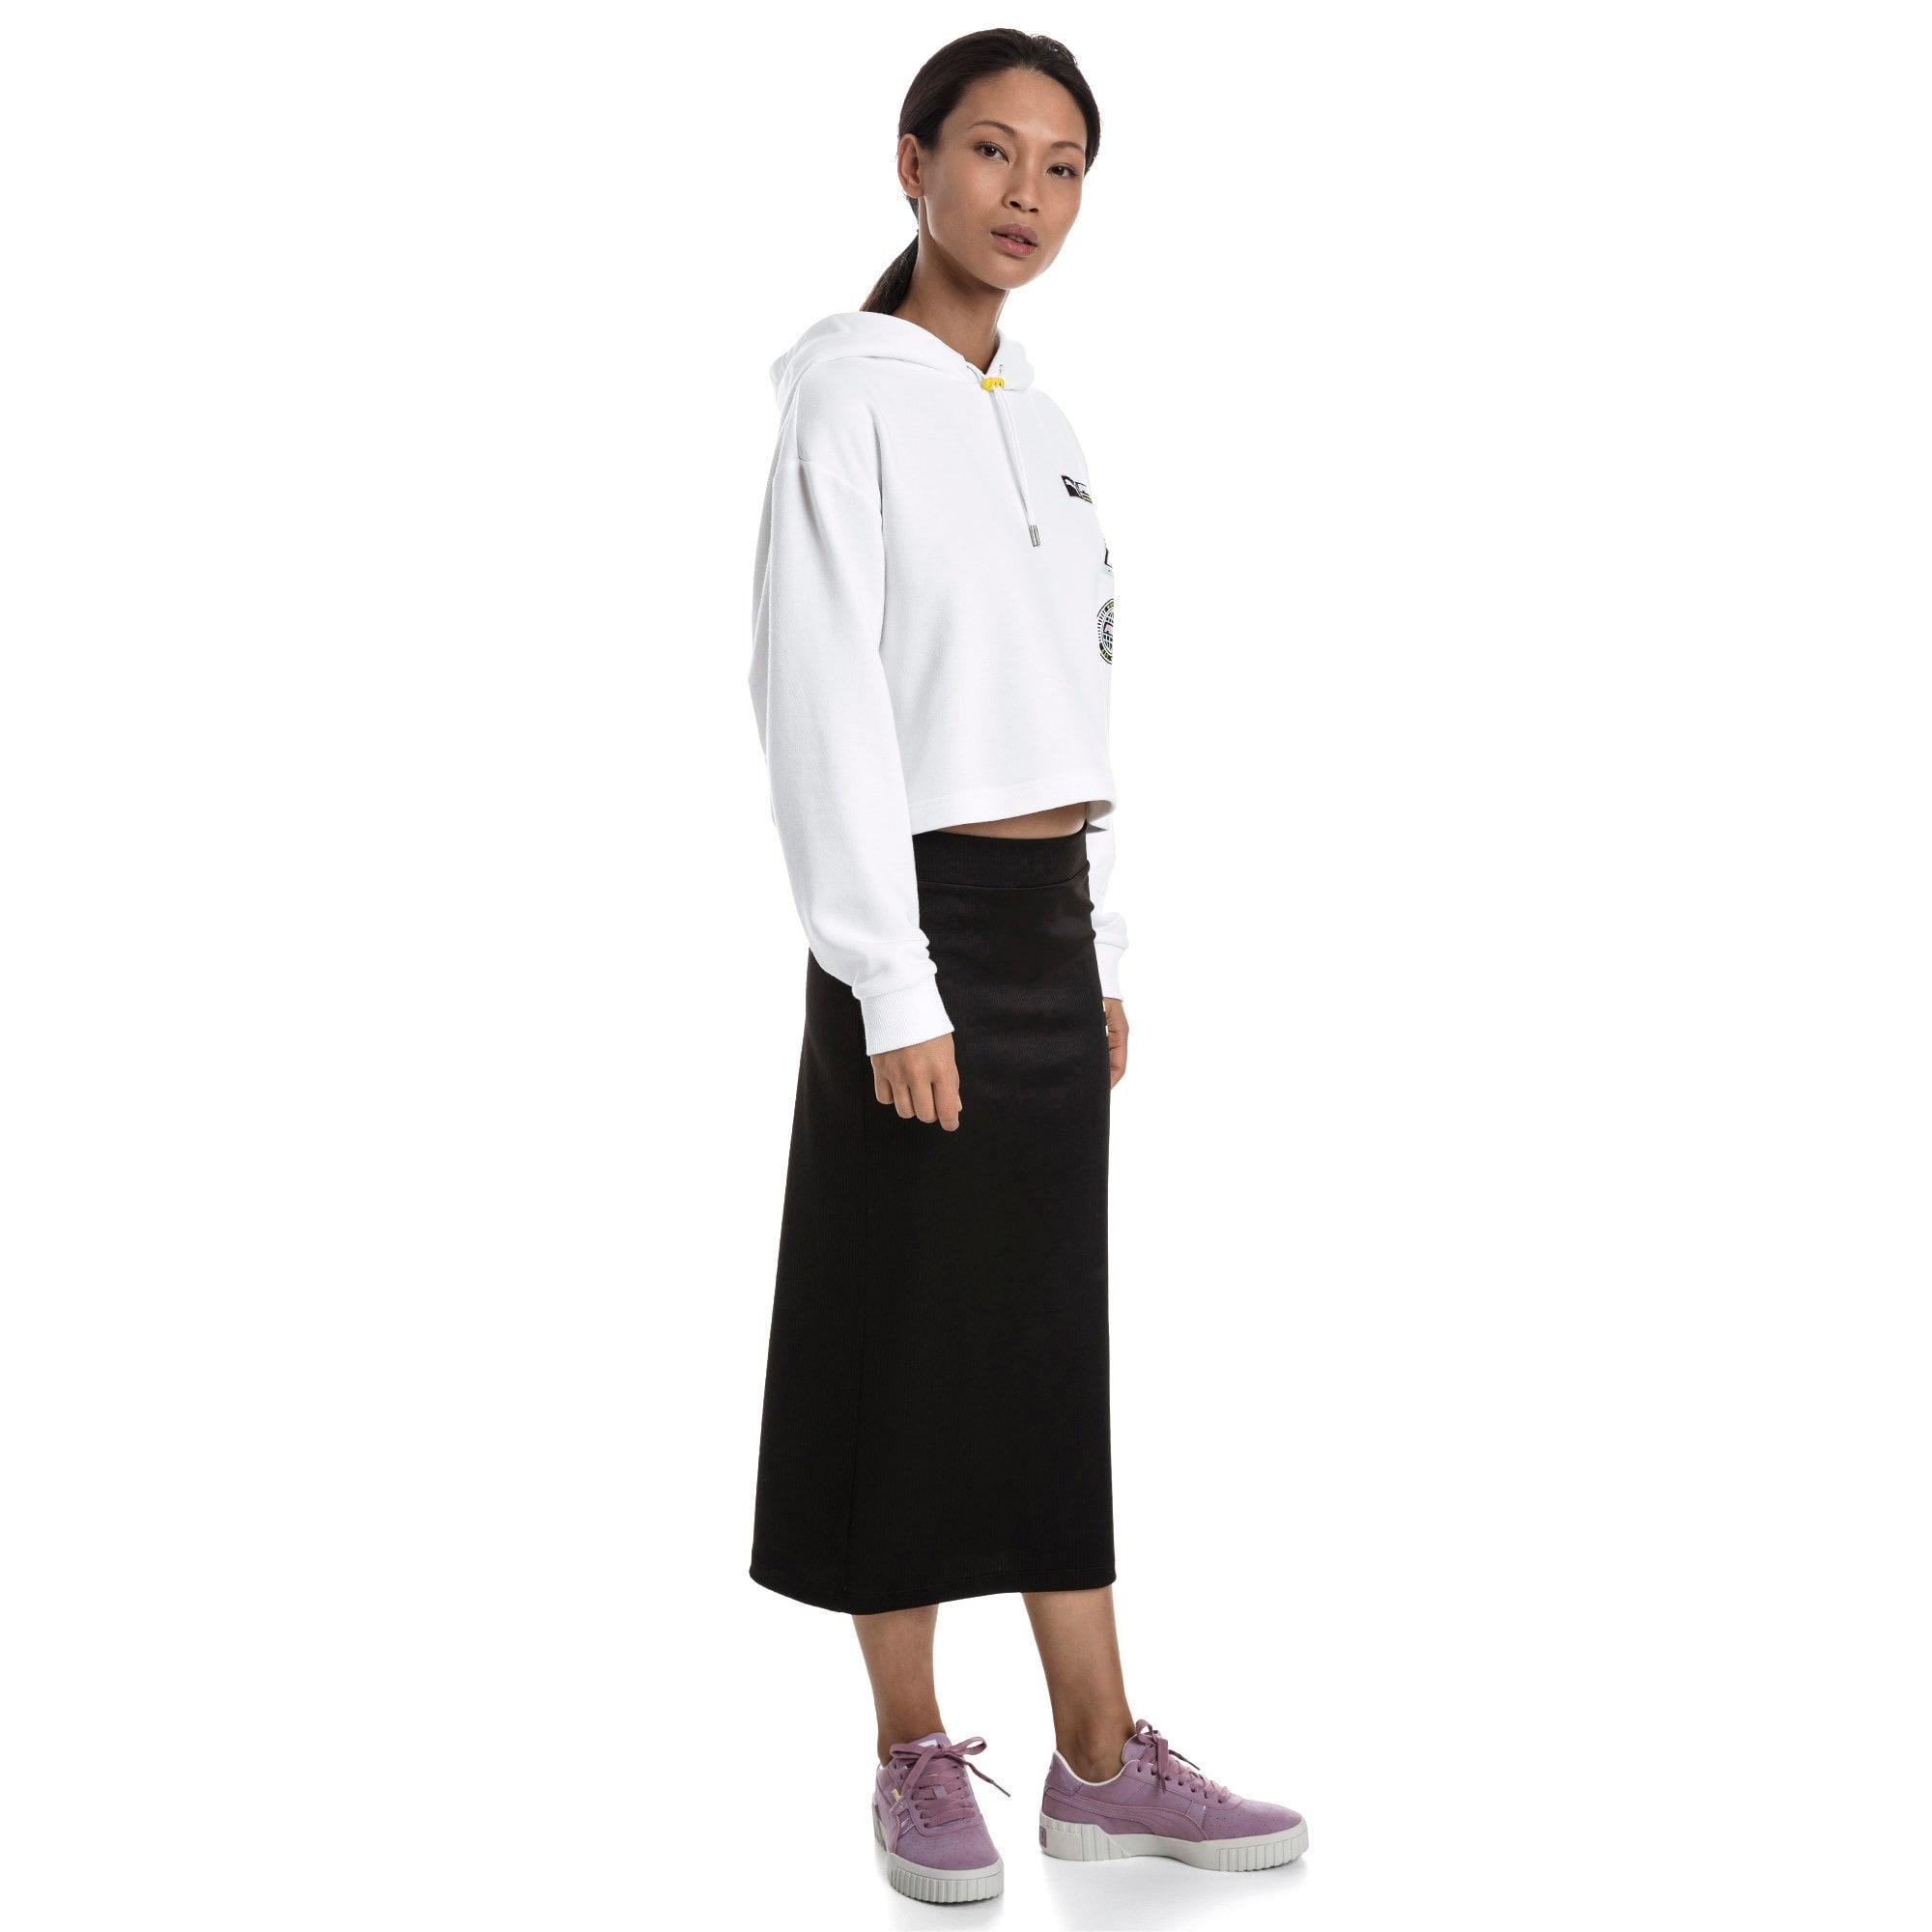 Thumbnail 3 van Trailblazer hoodie voor vrouwen, Puma White, medium